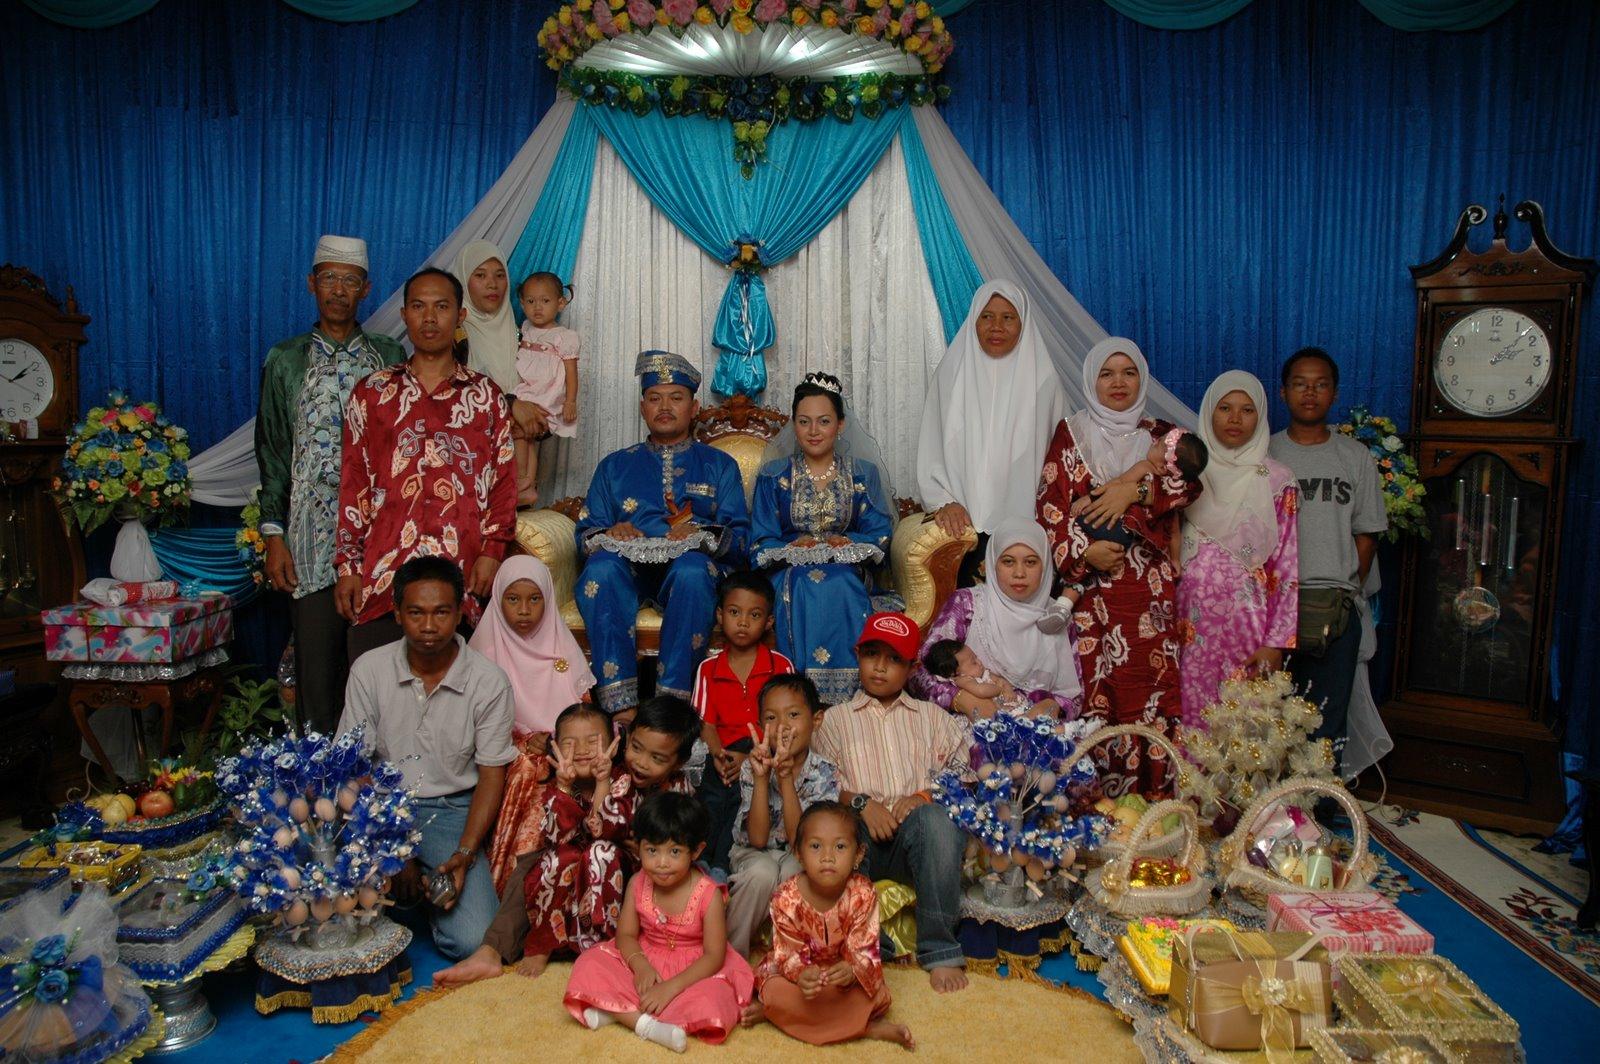 http://miskahmiskiah.blogspot.com/